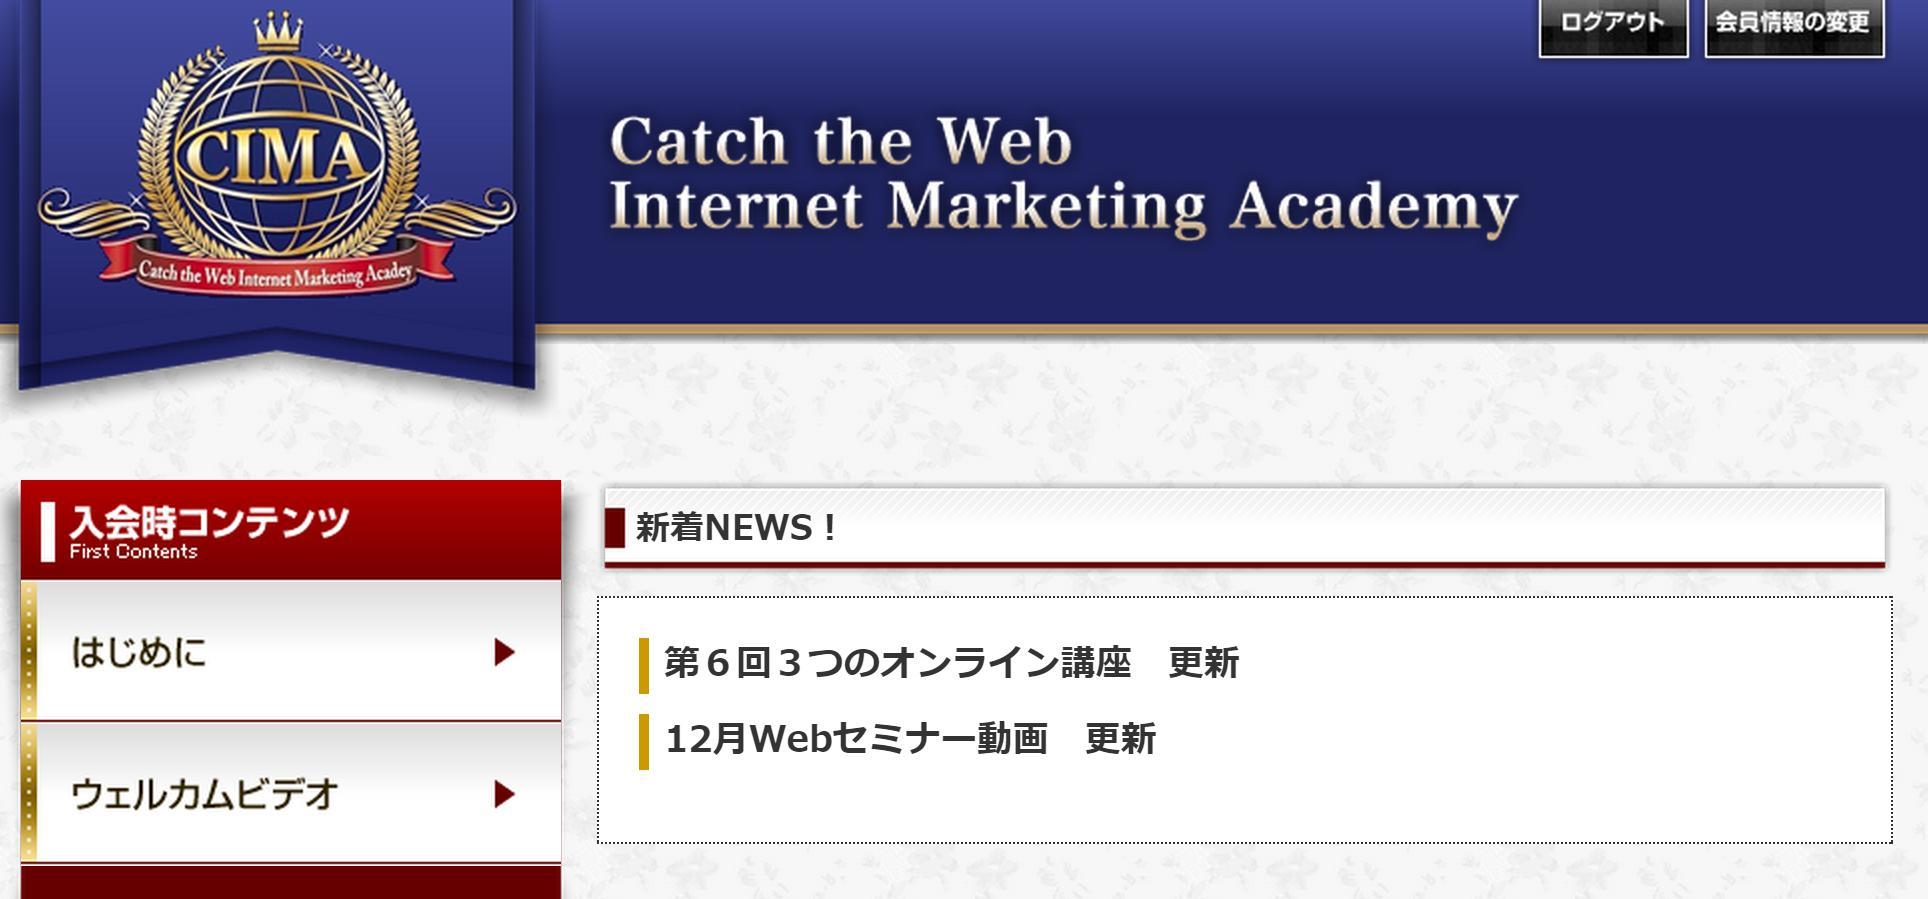 Catch the Web Internet Marketing Academy